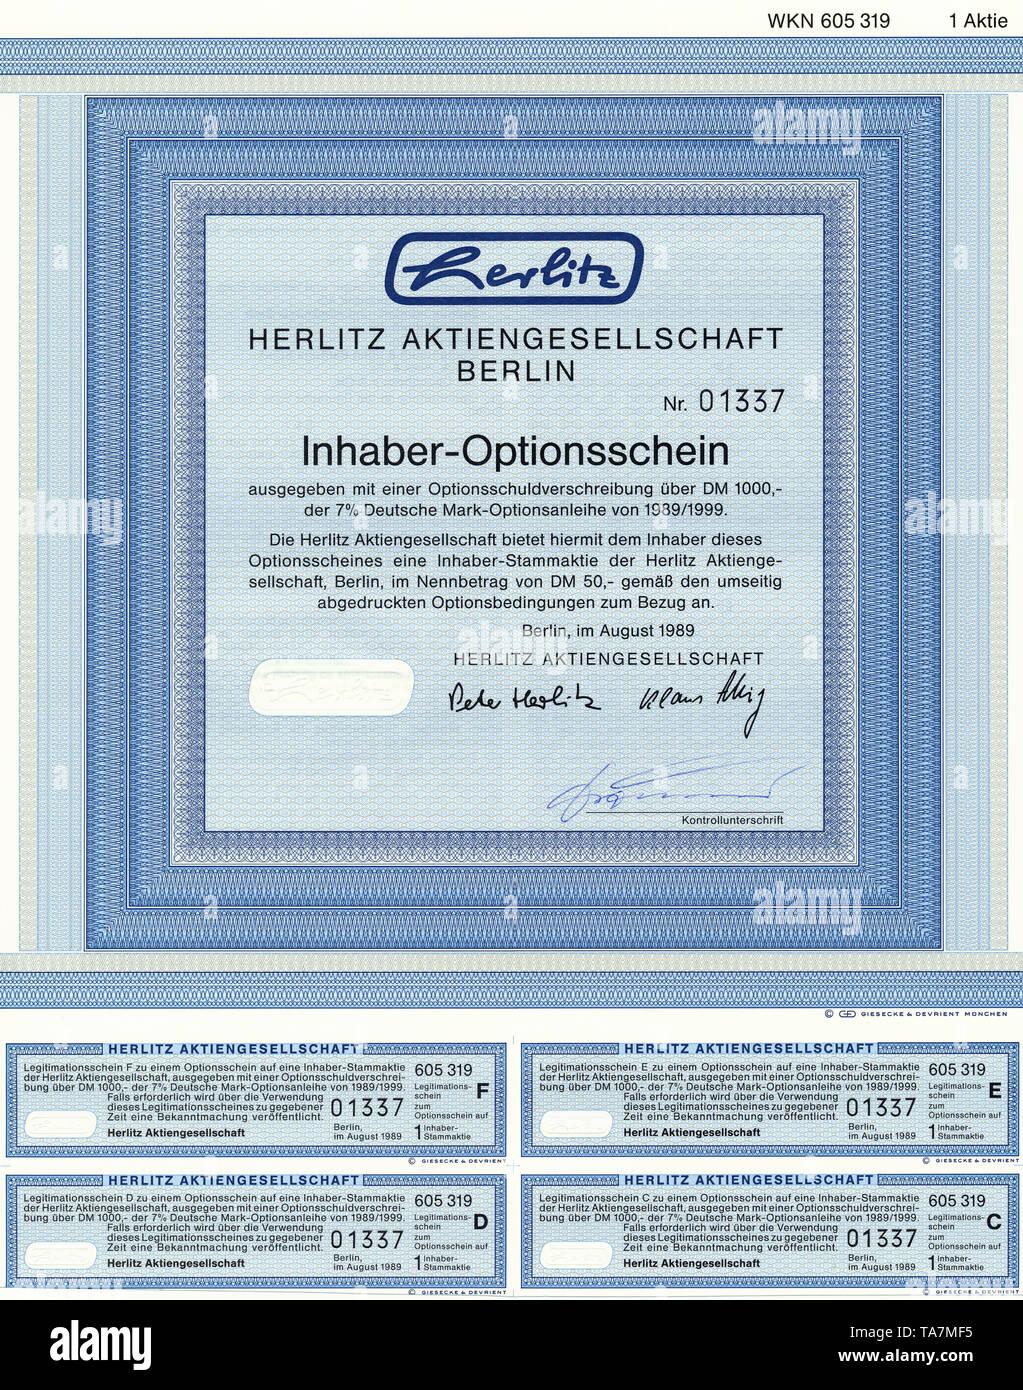 Historic stock certificate, Securities certificate, bearer warrant, Germany, Wertpapier, Inhaber-Optionsschein, Deutsche Mark, Bürobedarf, Herlitz Aktiengesellschaft, Berlin, 1989, Deutschland, Europa - Stock Image